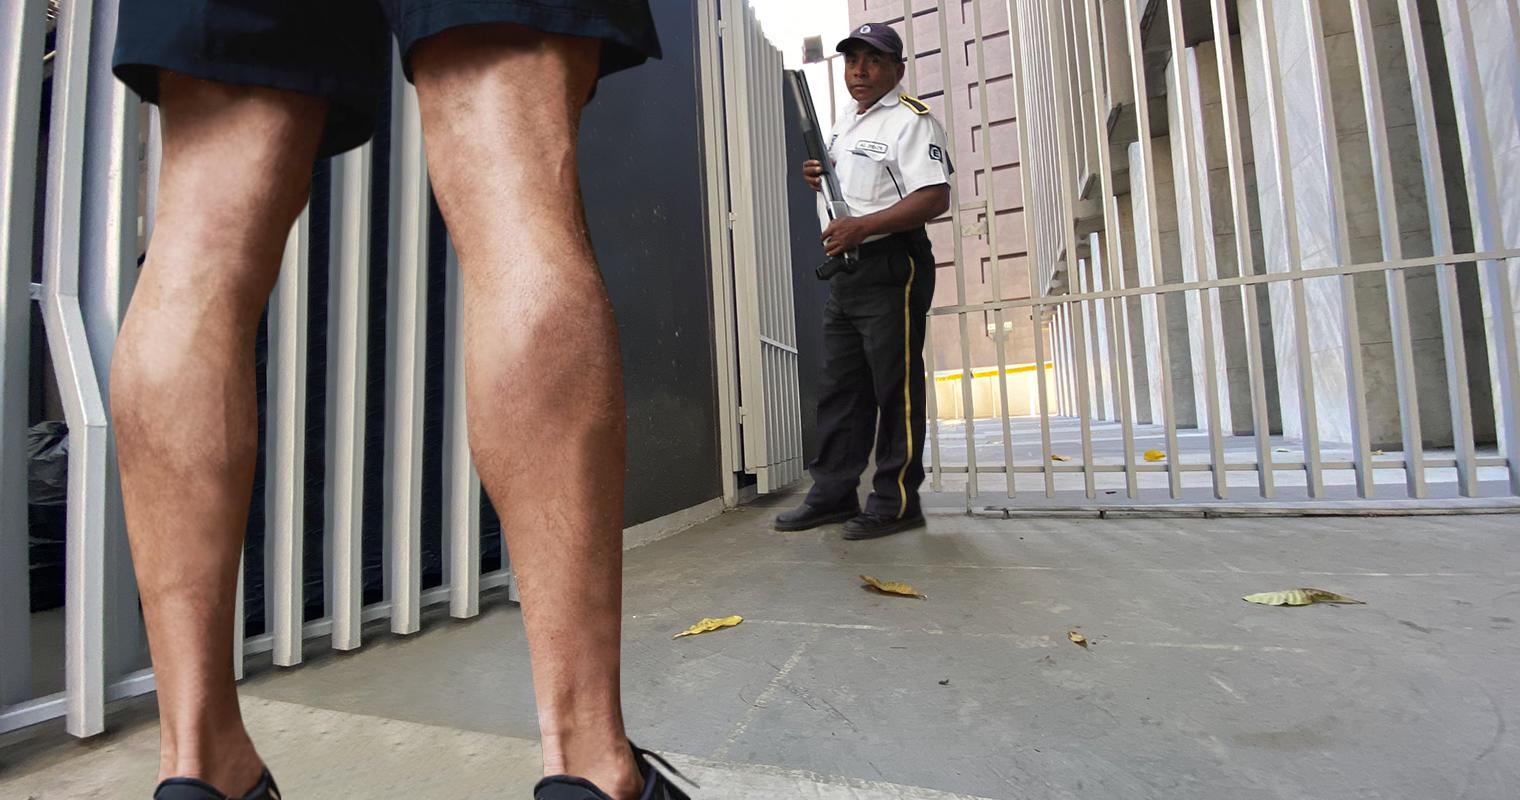 Vigilante no deja entrar a chamo en shorts a ministerio por envidia a sus HERMOSAS batatas